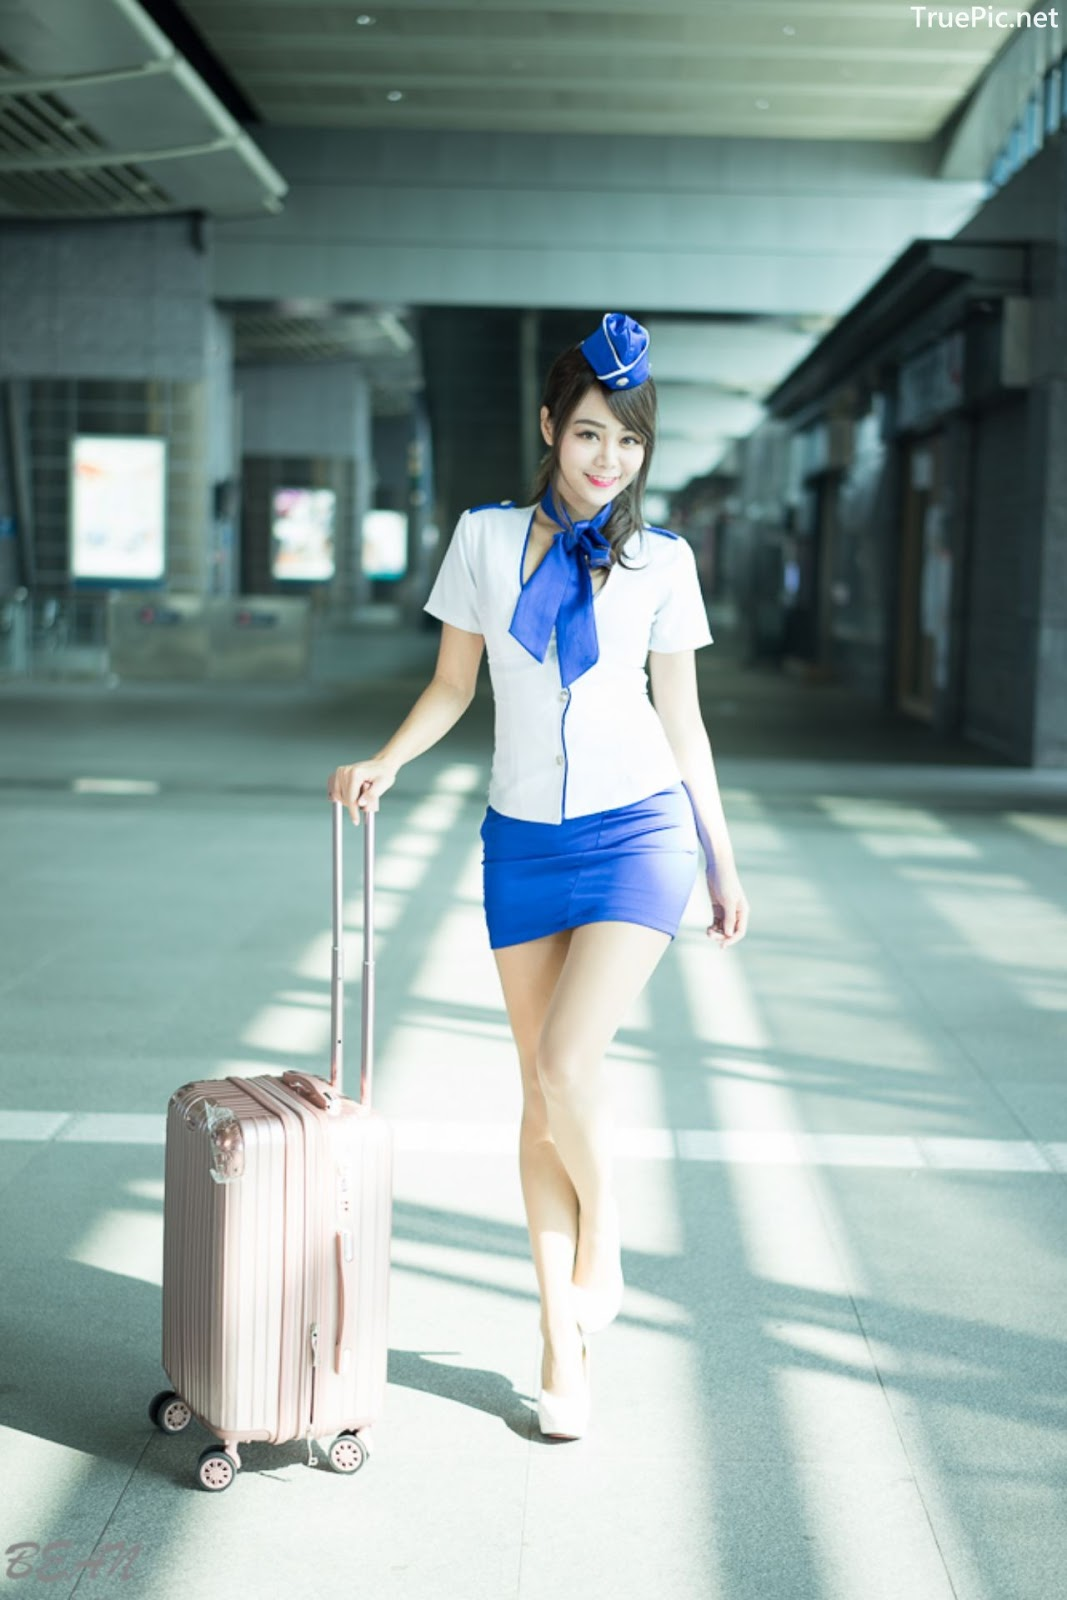 Image-Taiwan-Social-Celebrity-Sun-Hui-Tong-孫卉彤-Stewardess-High-speed-Railway-TruePic.net- Picture-2